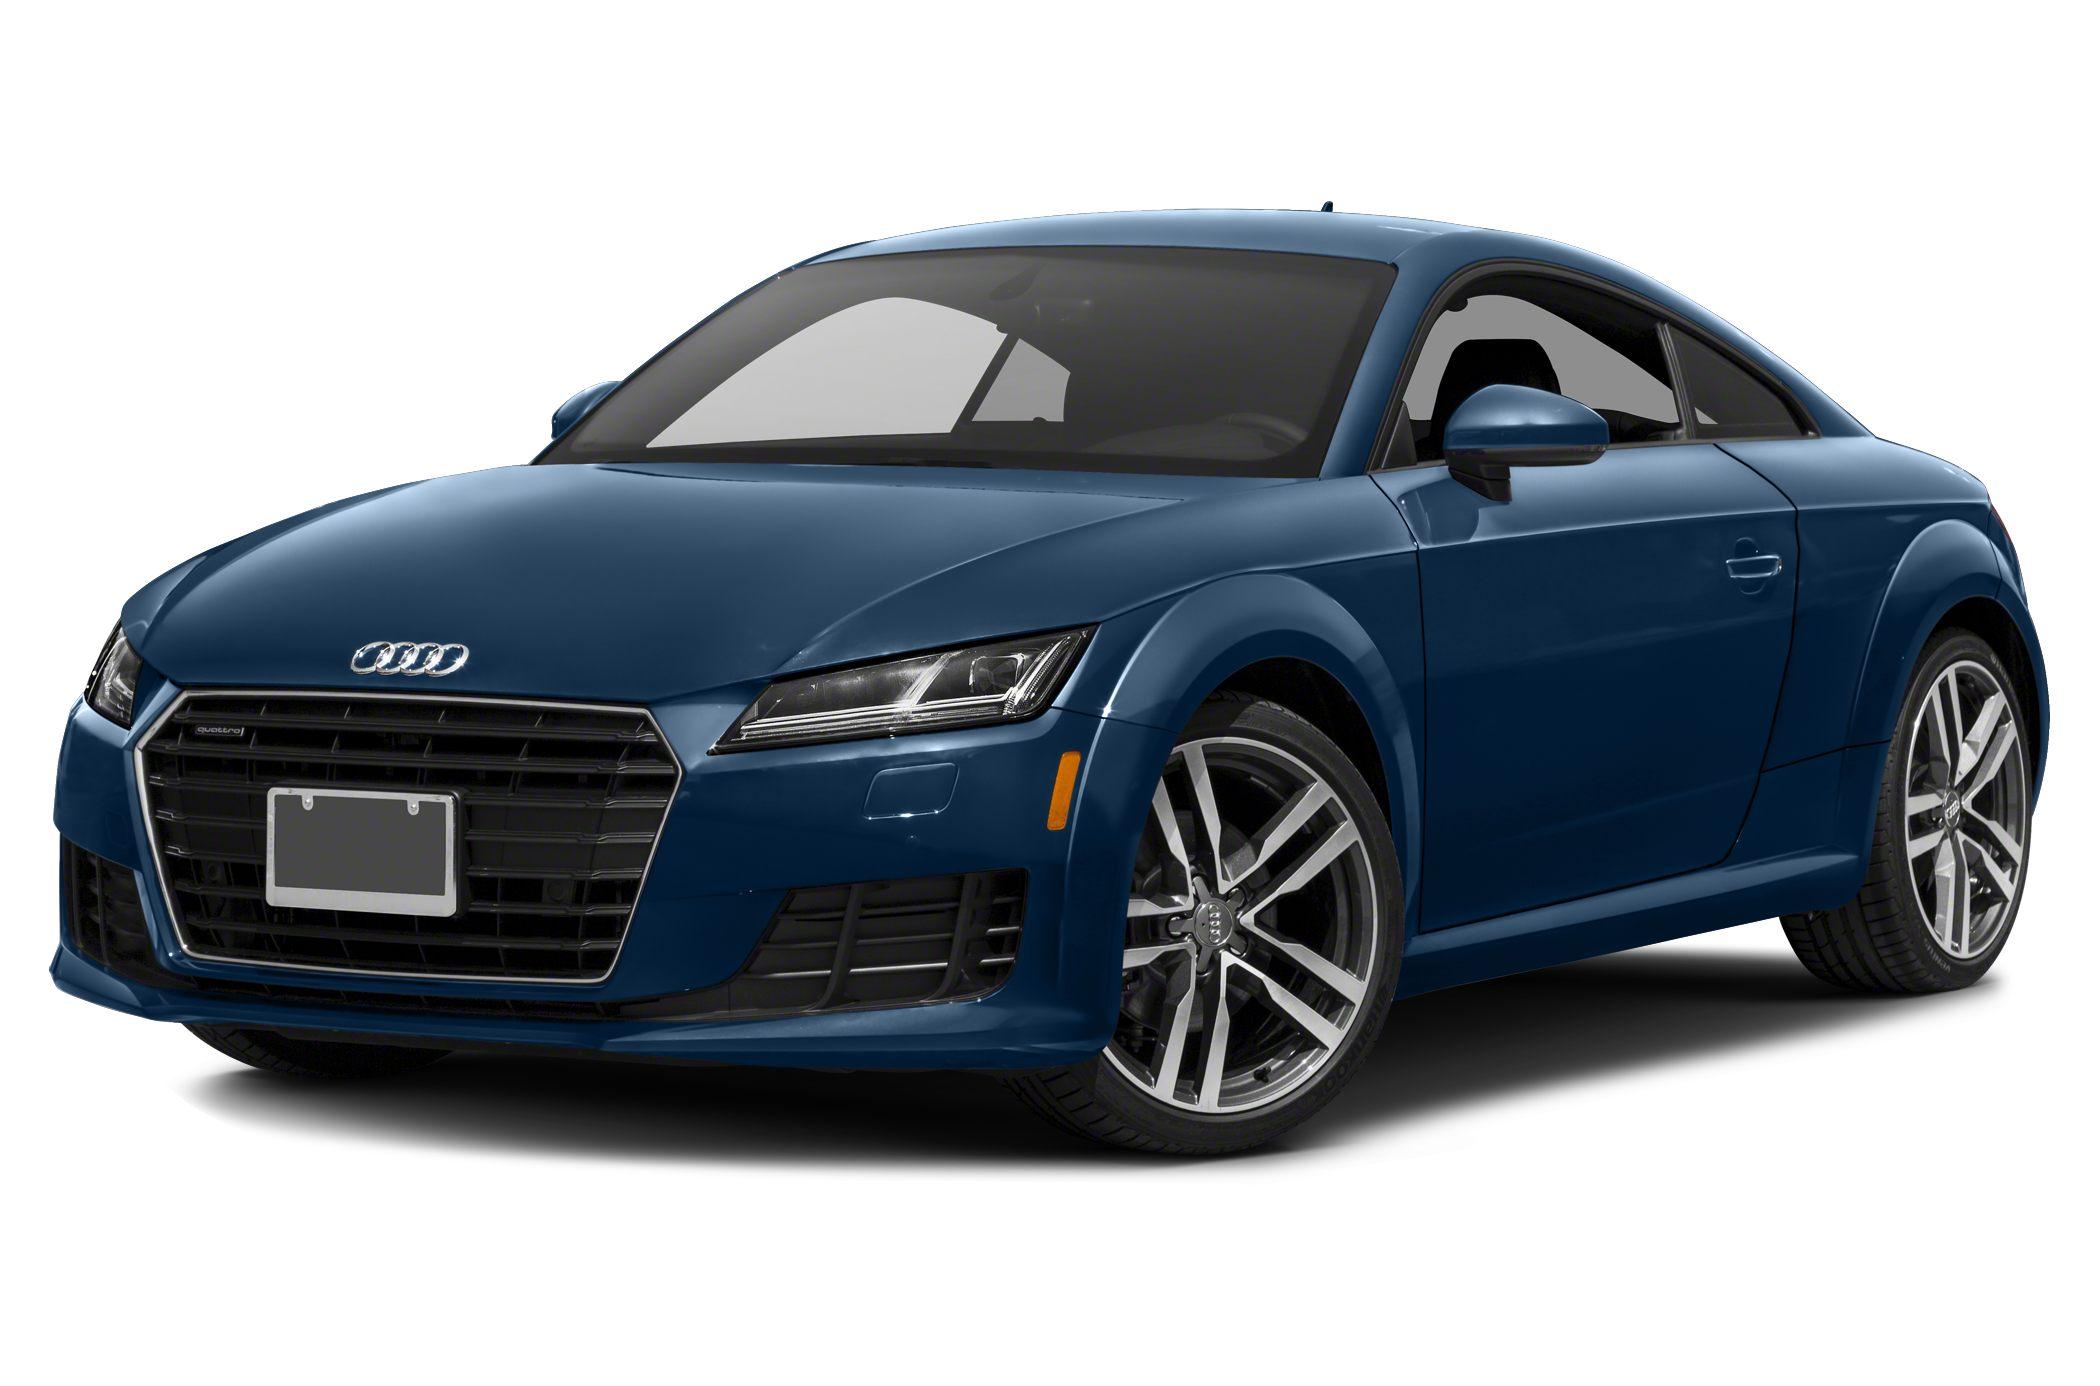 2018 audi tt 2.0t 2dr all-wheel drive quattro coupe information